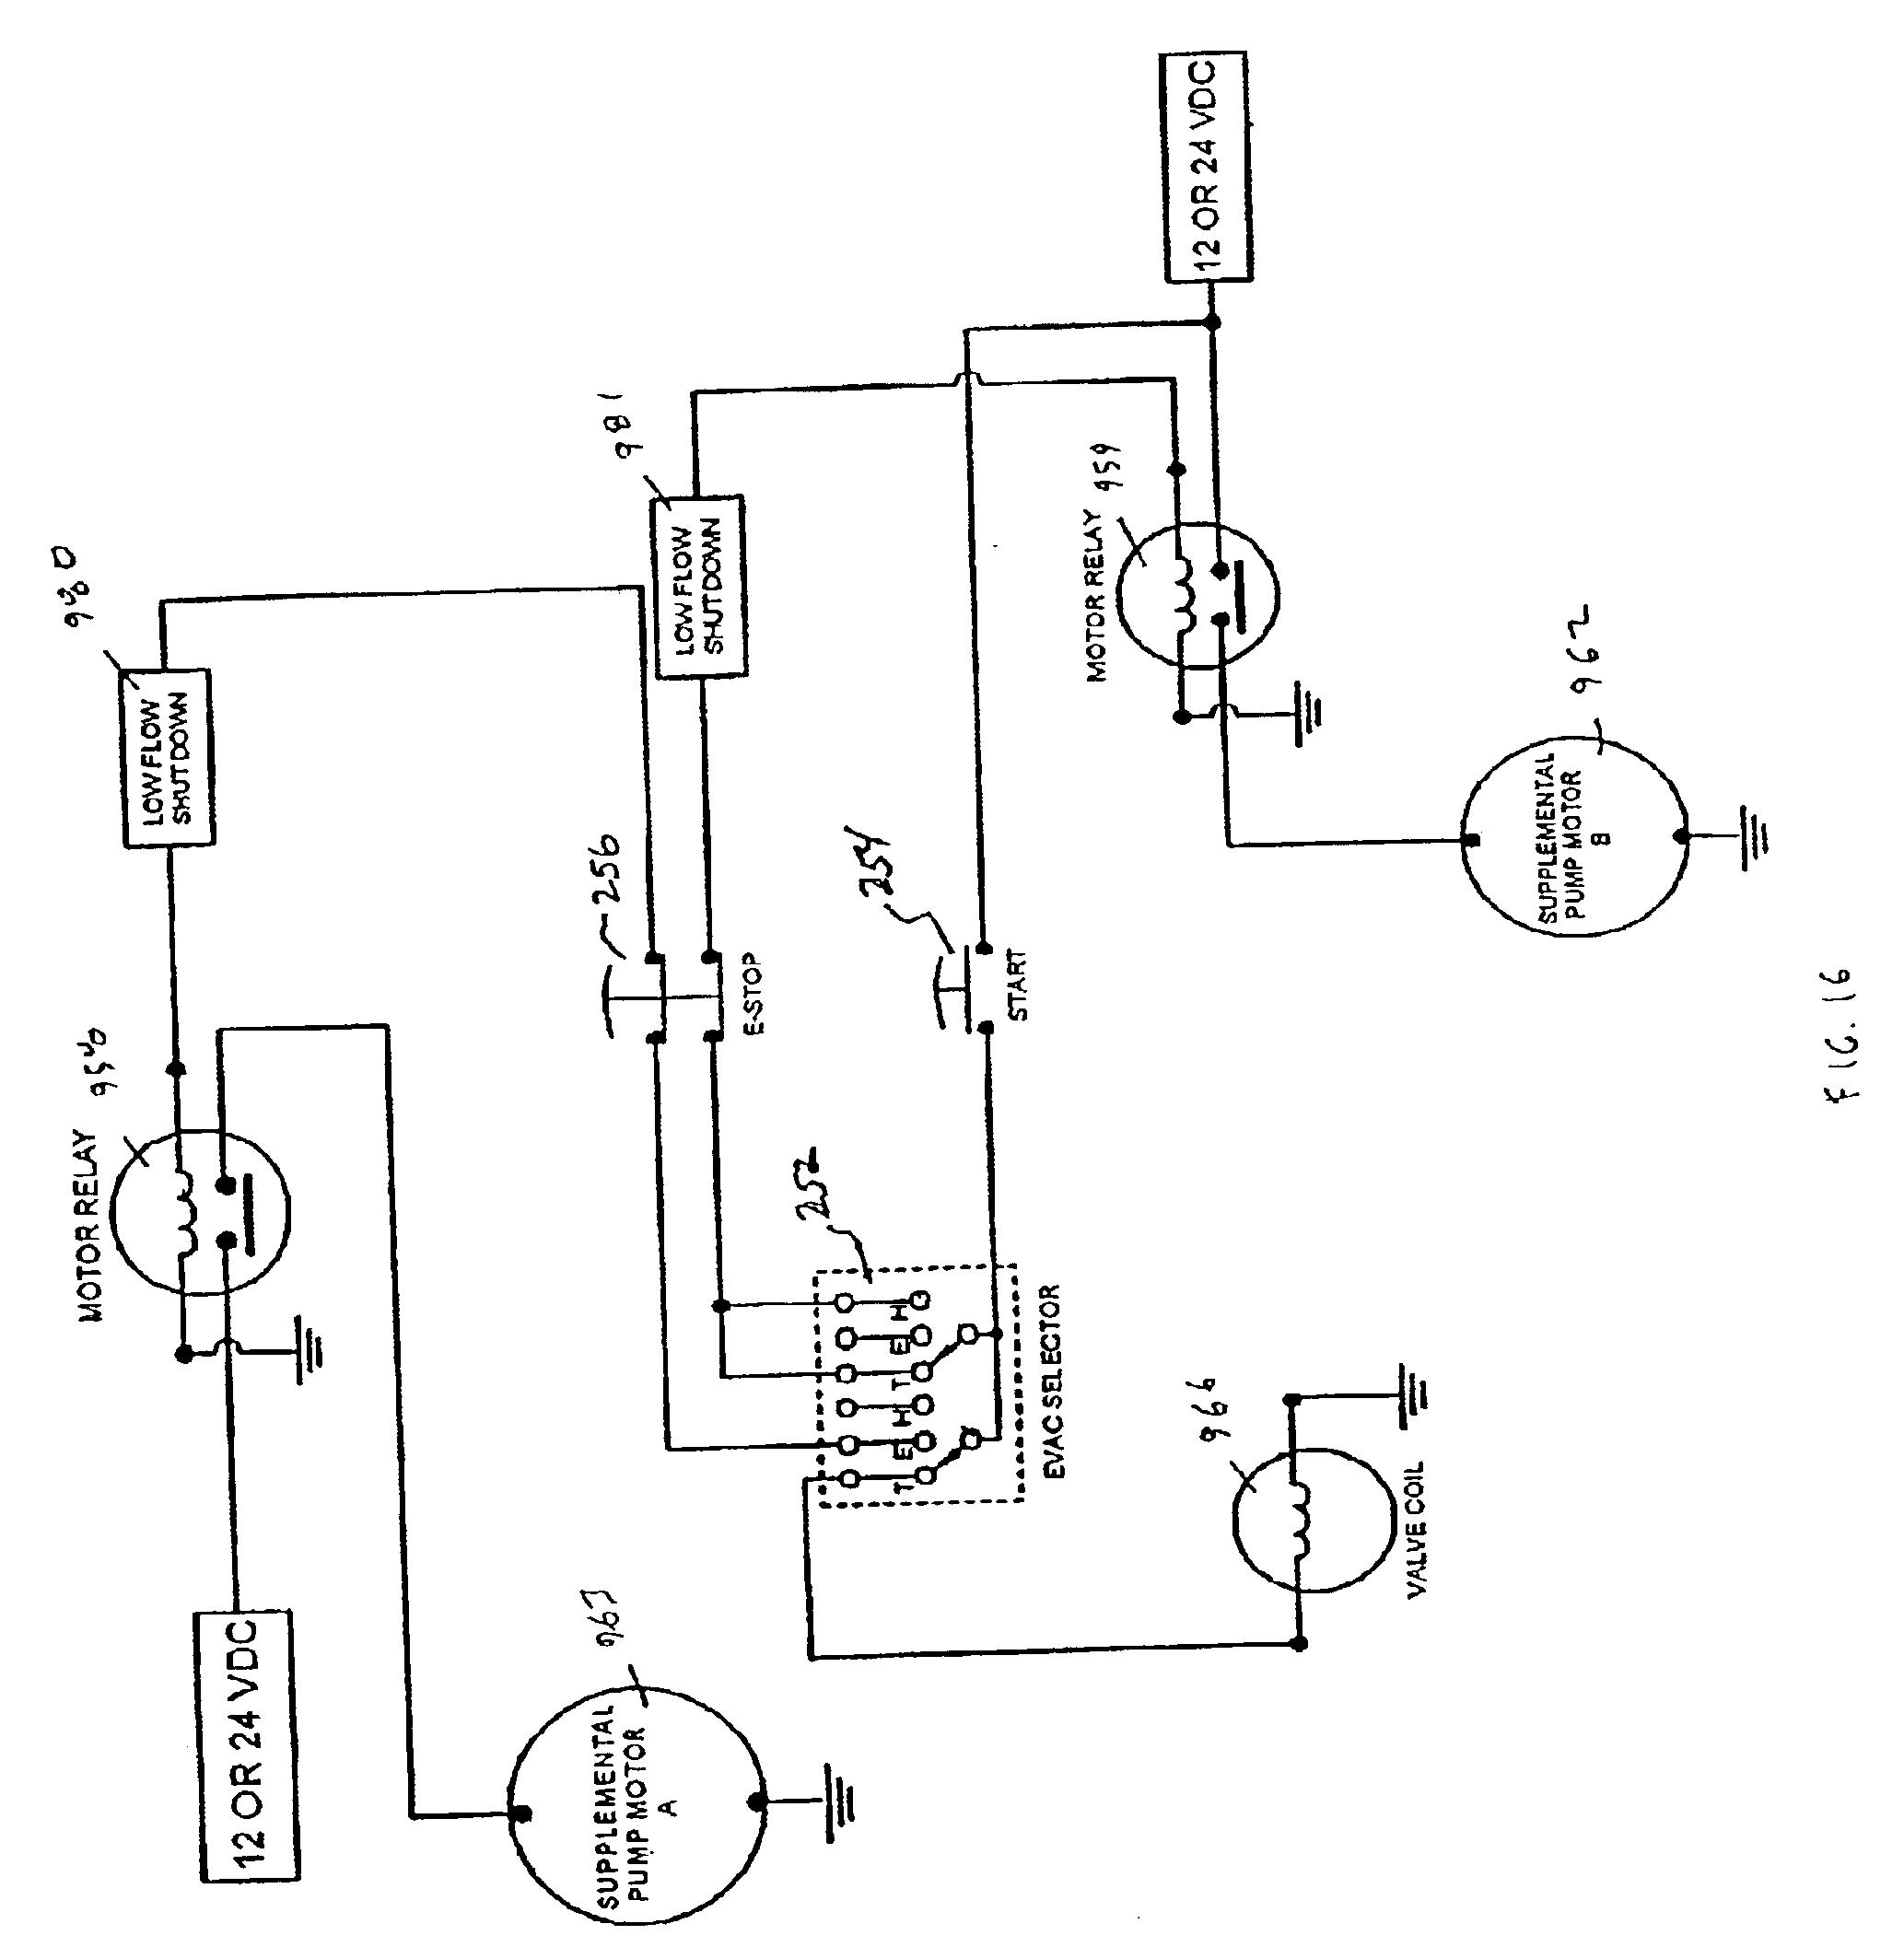 farmall cub tractor diagrams